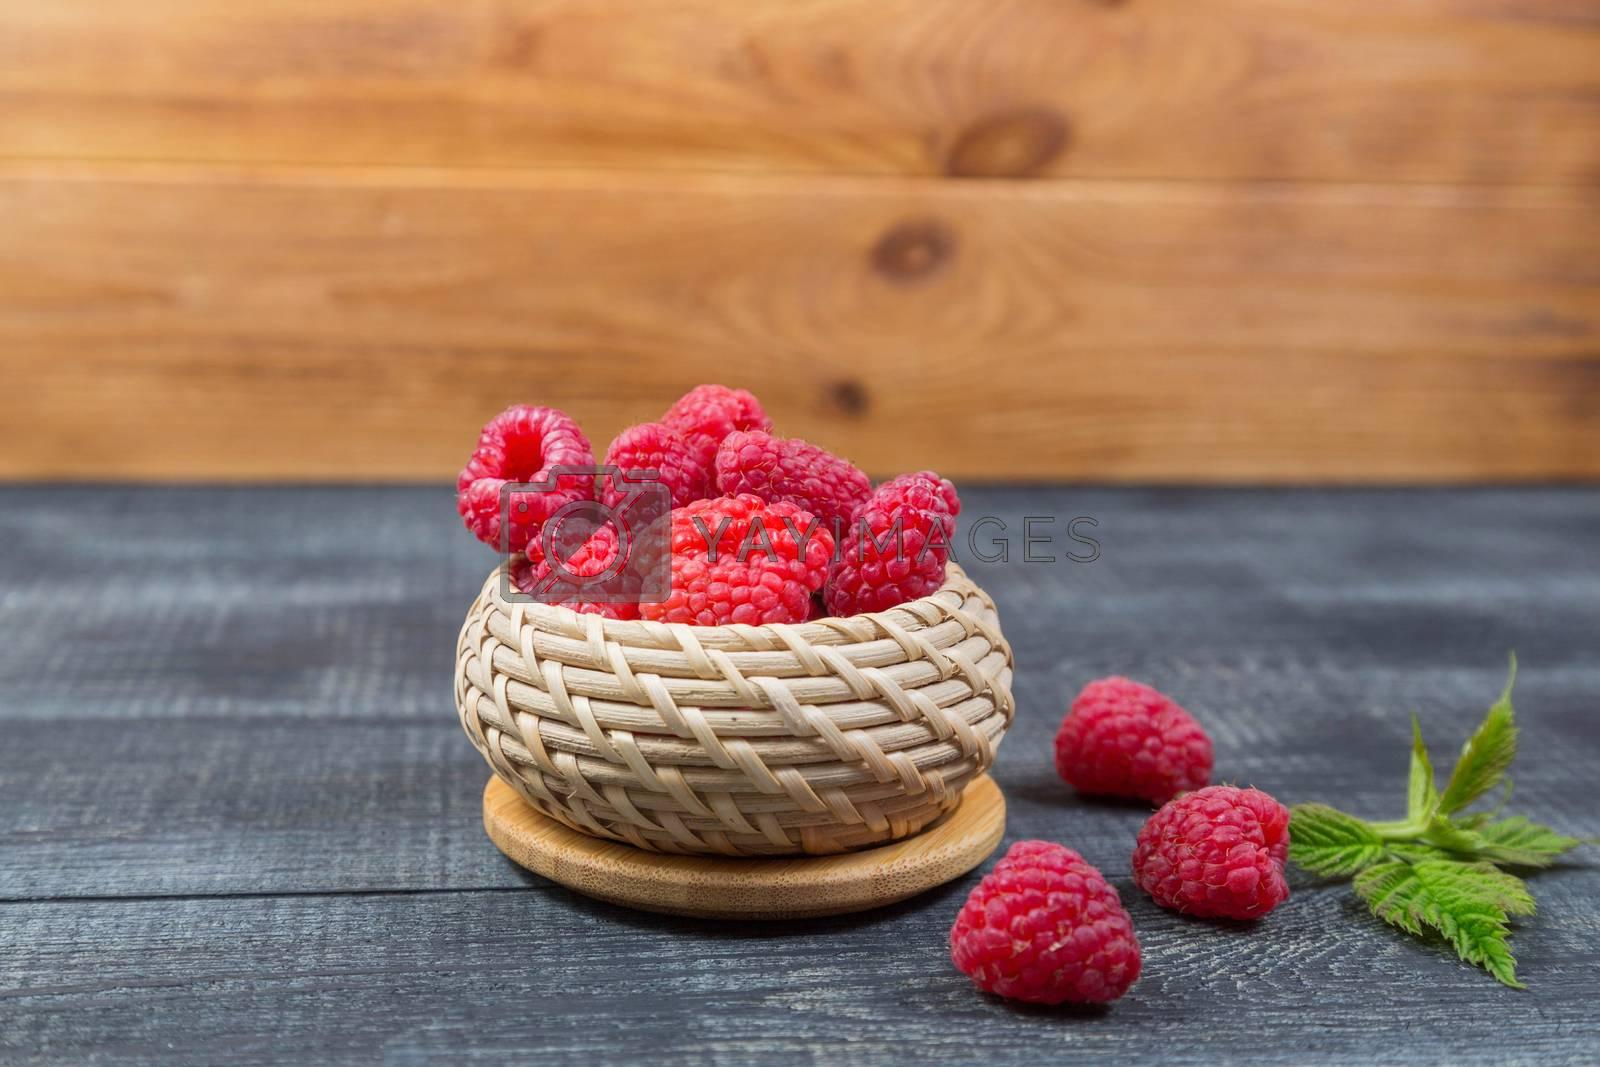 Raspberry. Health, summer. still life on wooden background